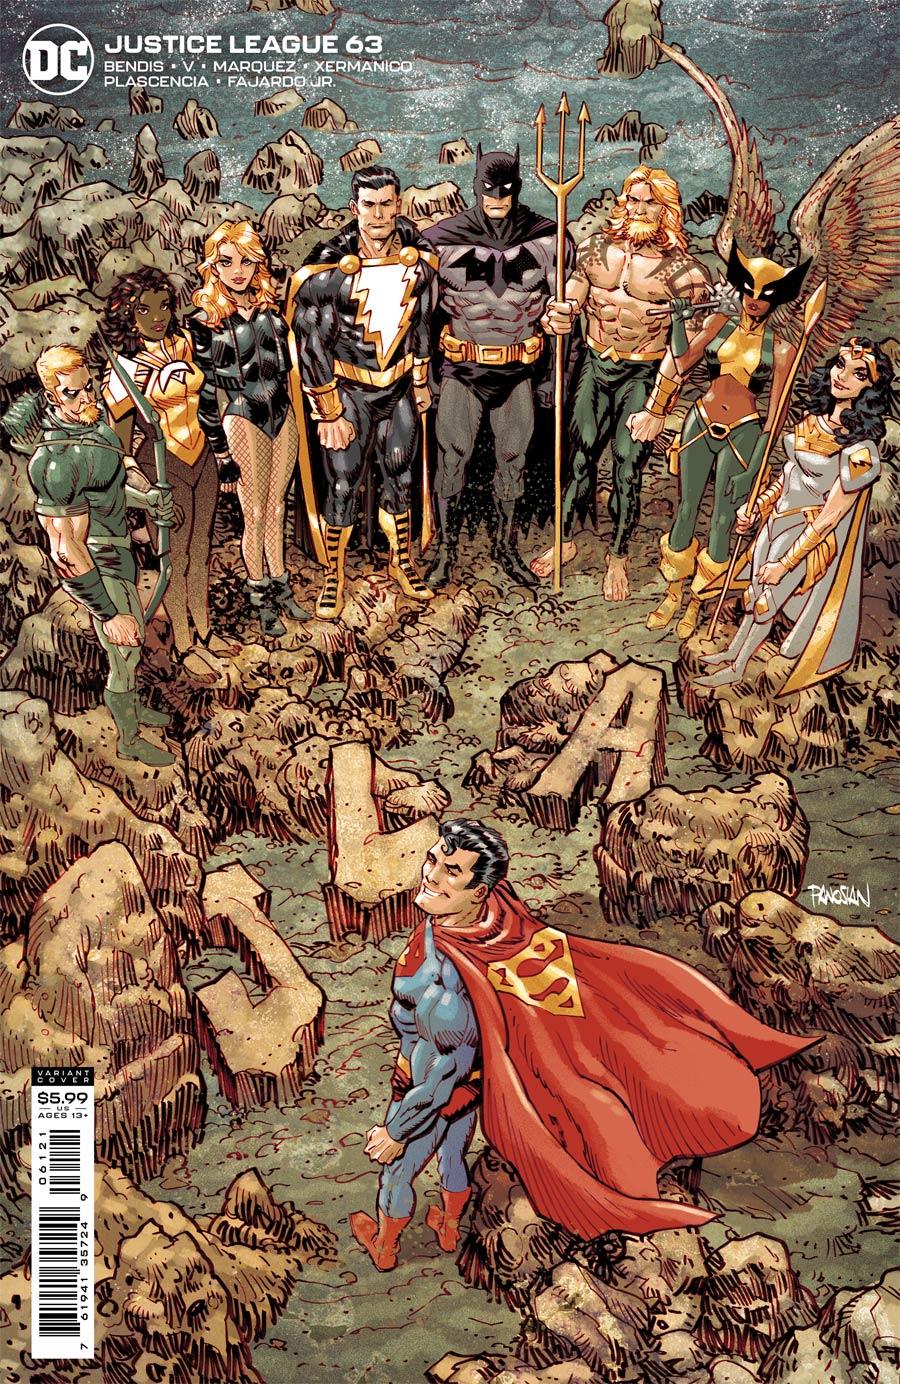 Justice League Vol 4 #63 Cover B Variant Dan Panosian Card Stock Cover